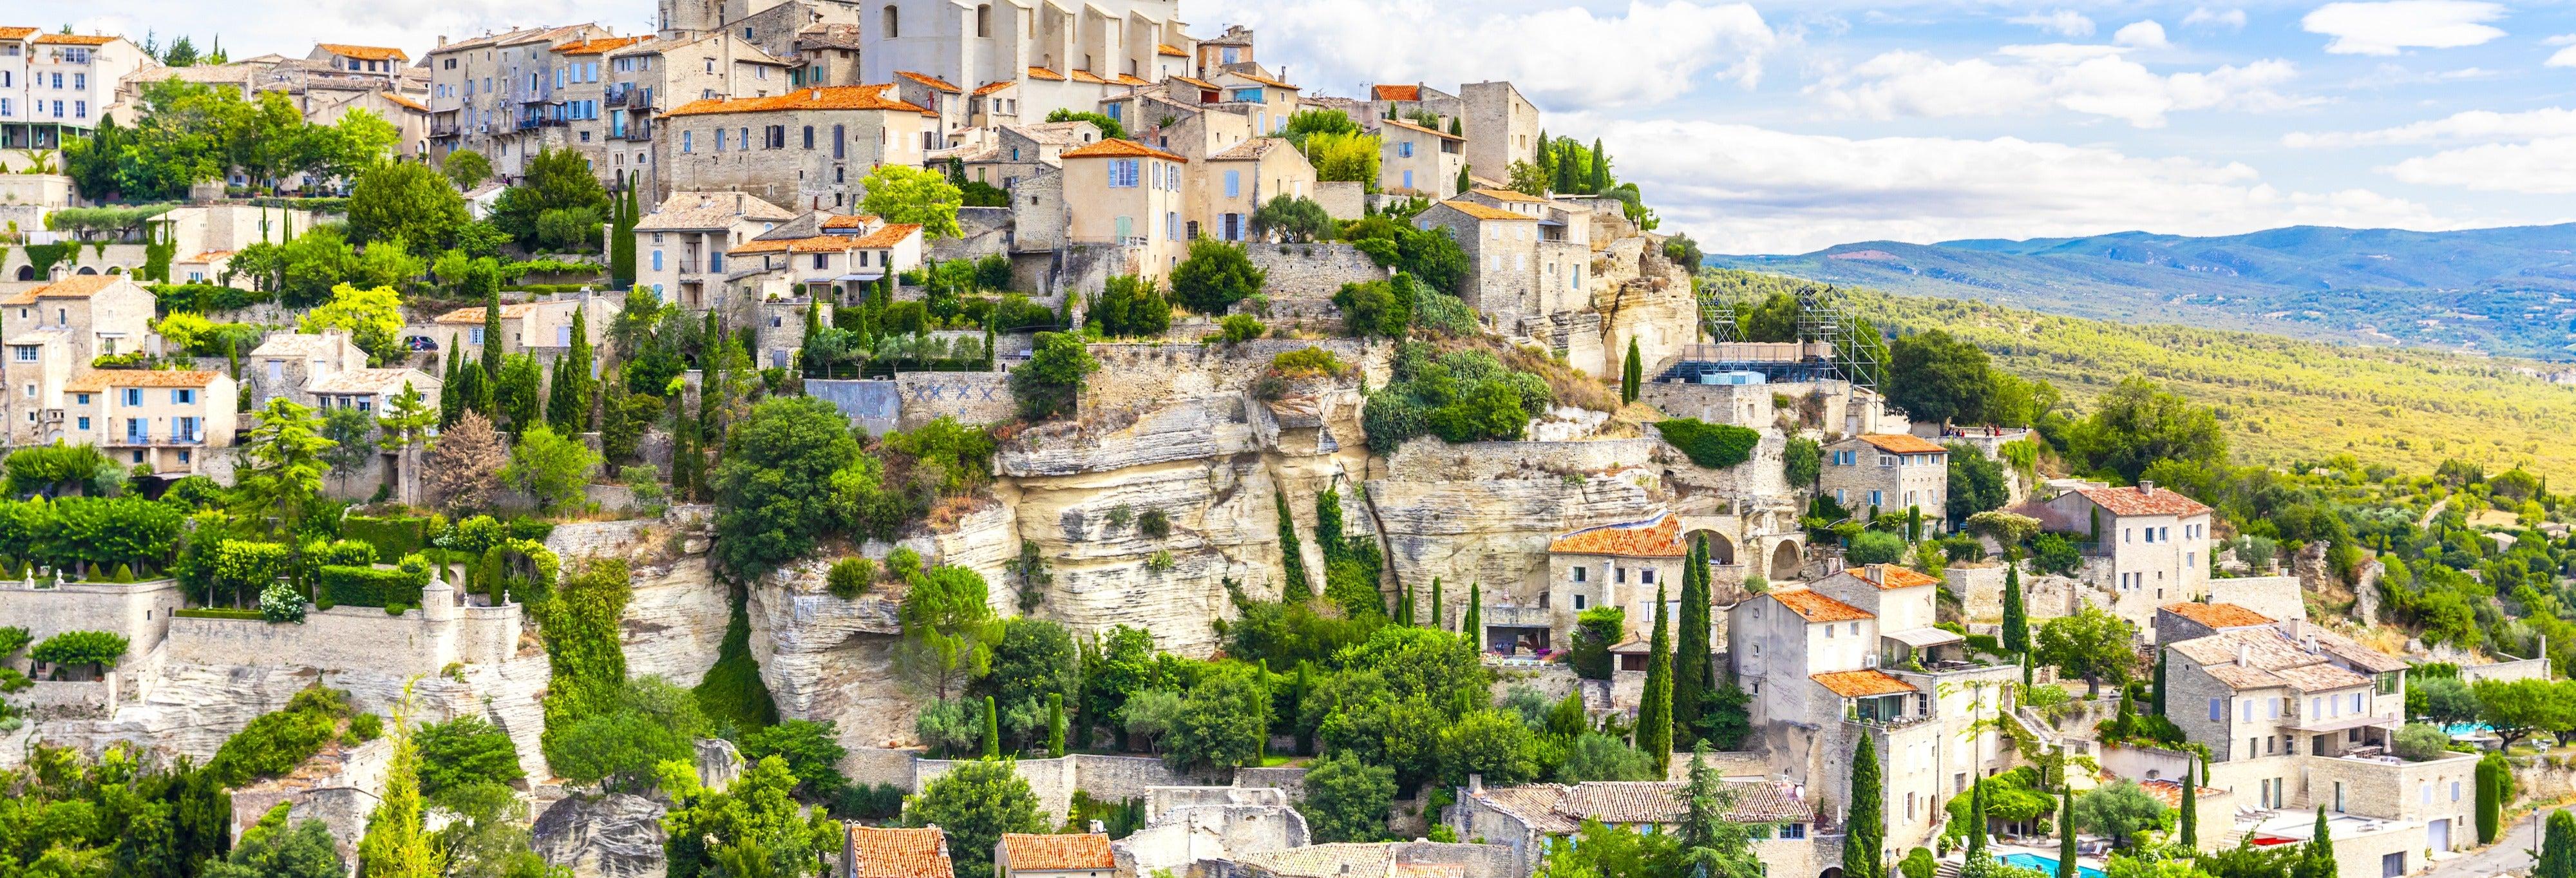 Roussillon, Lourmarin y Gordes + Mercado provenzal